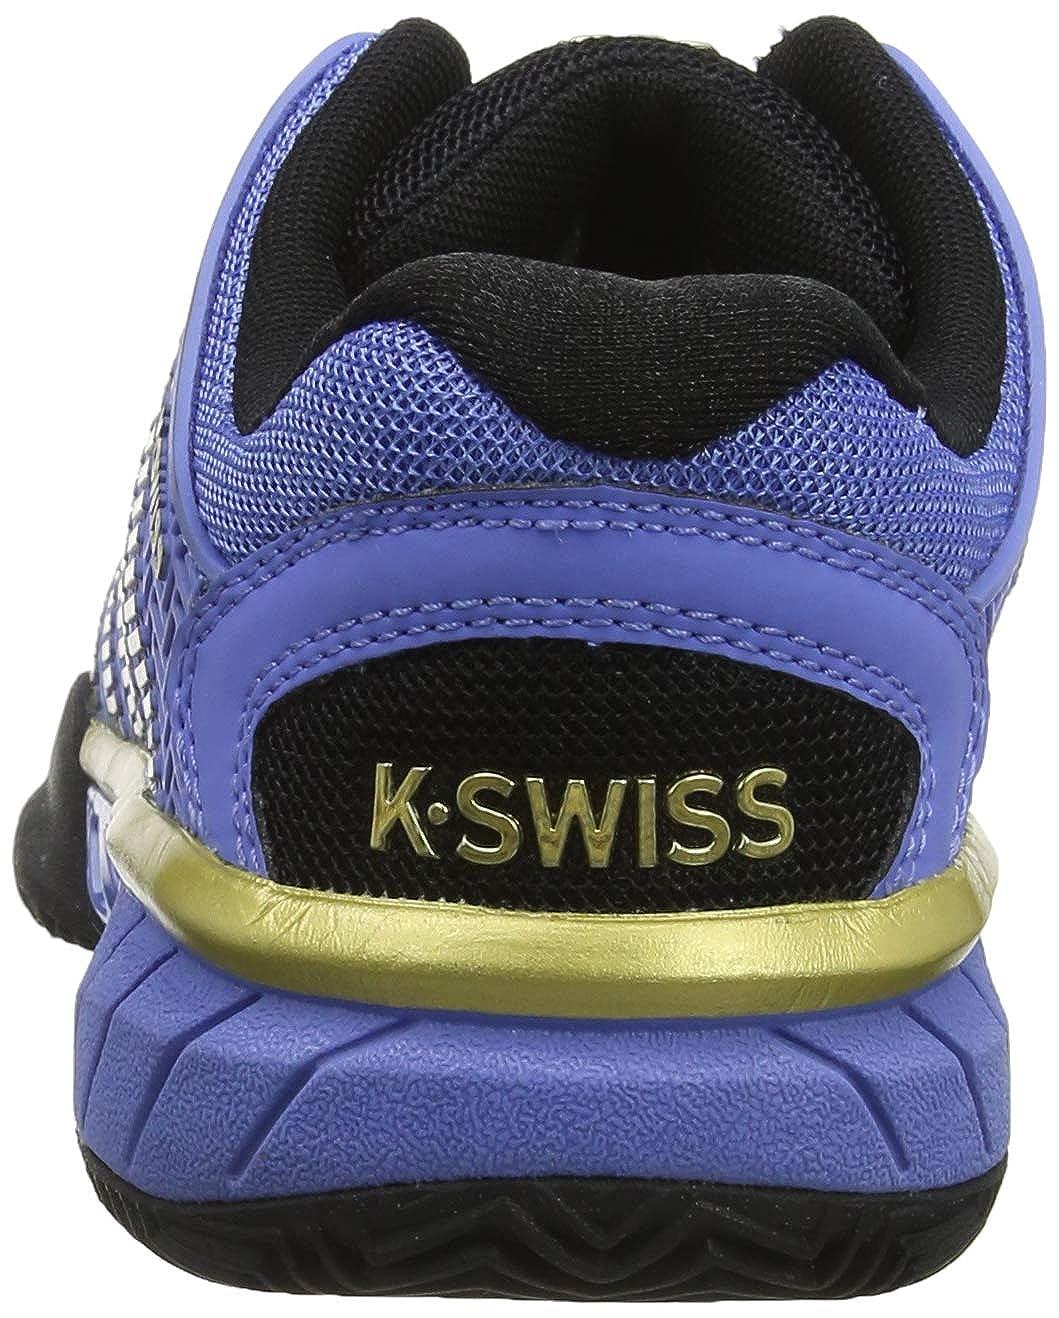 K-Swiss KS Hypercourtexprs Hb50, Zapatillas de Tenis para Mujer